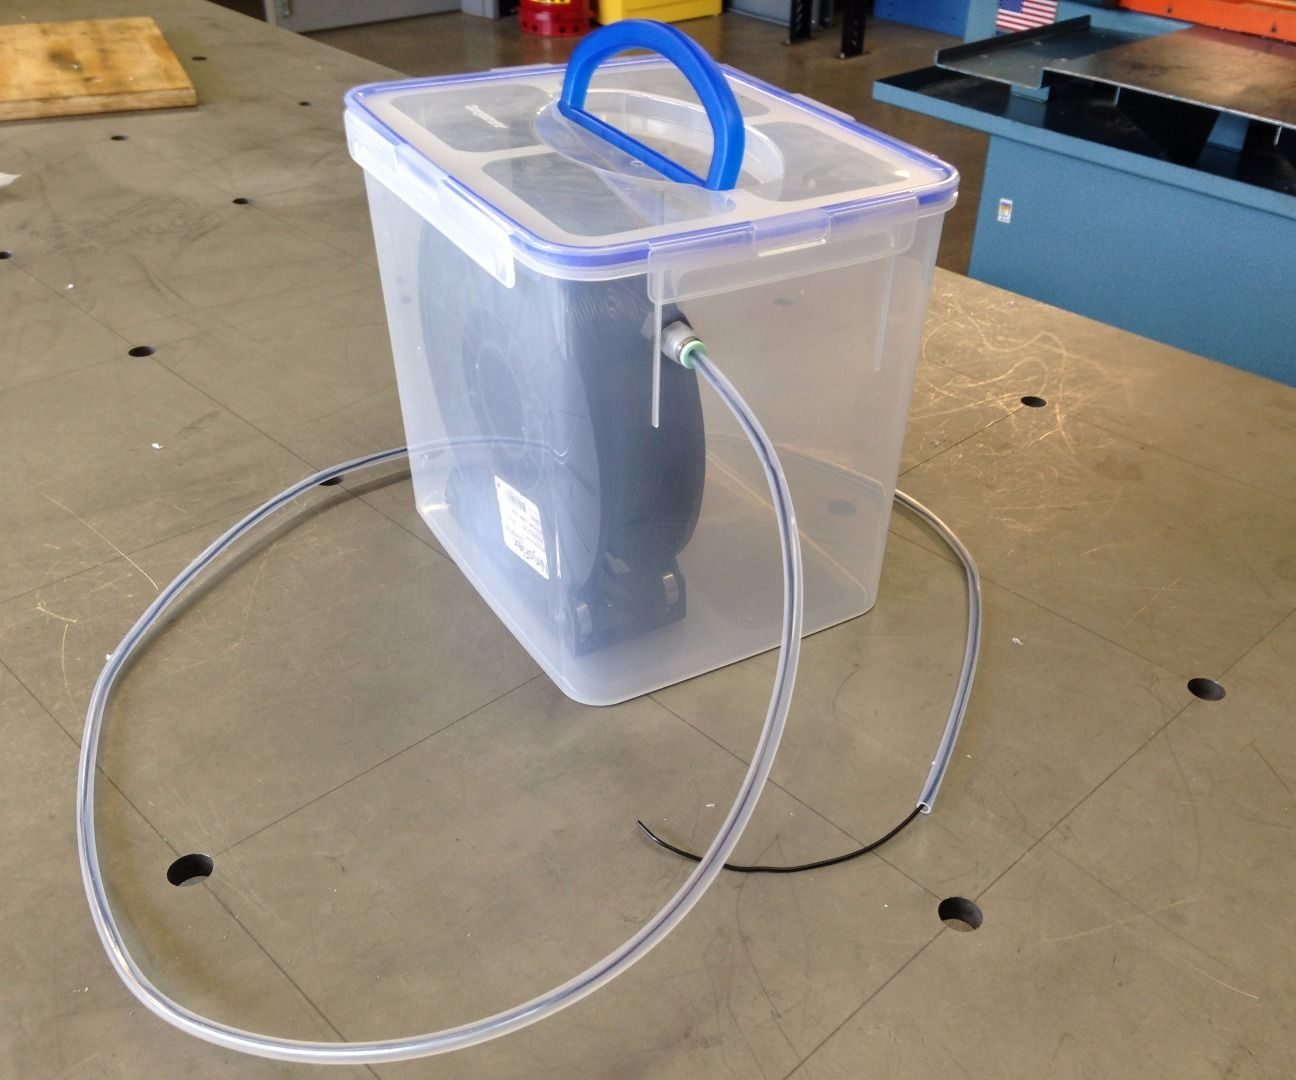 3D Printer Filament Desiccator Chamber for Hygroscopic Materials